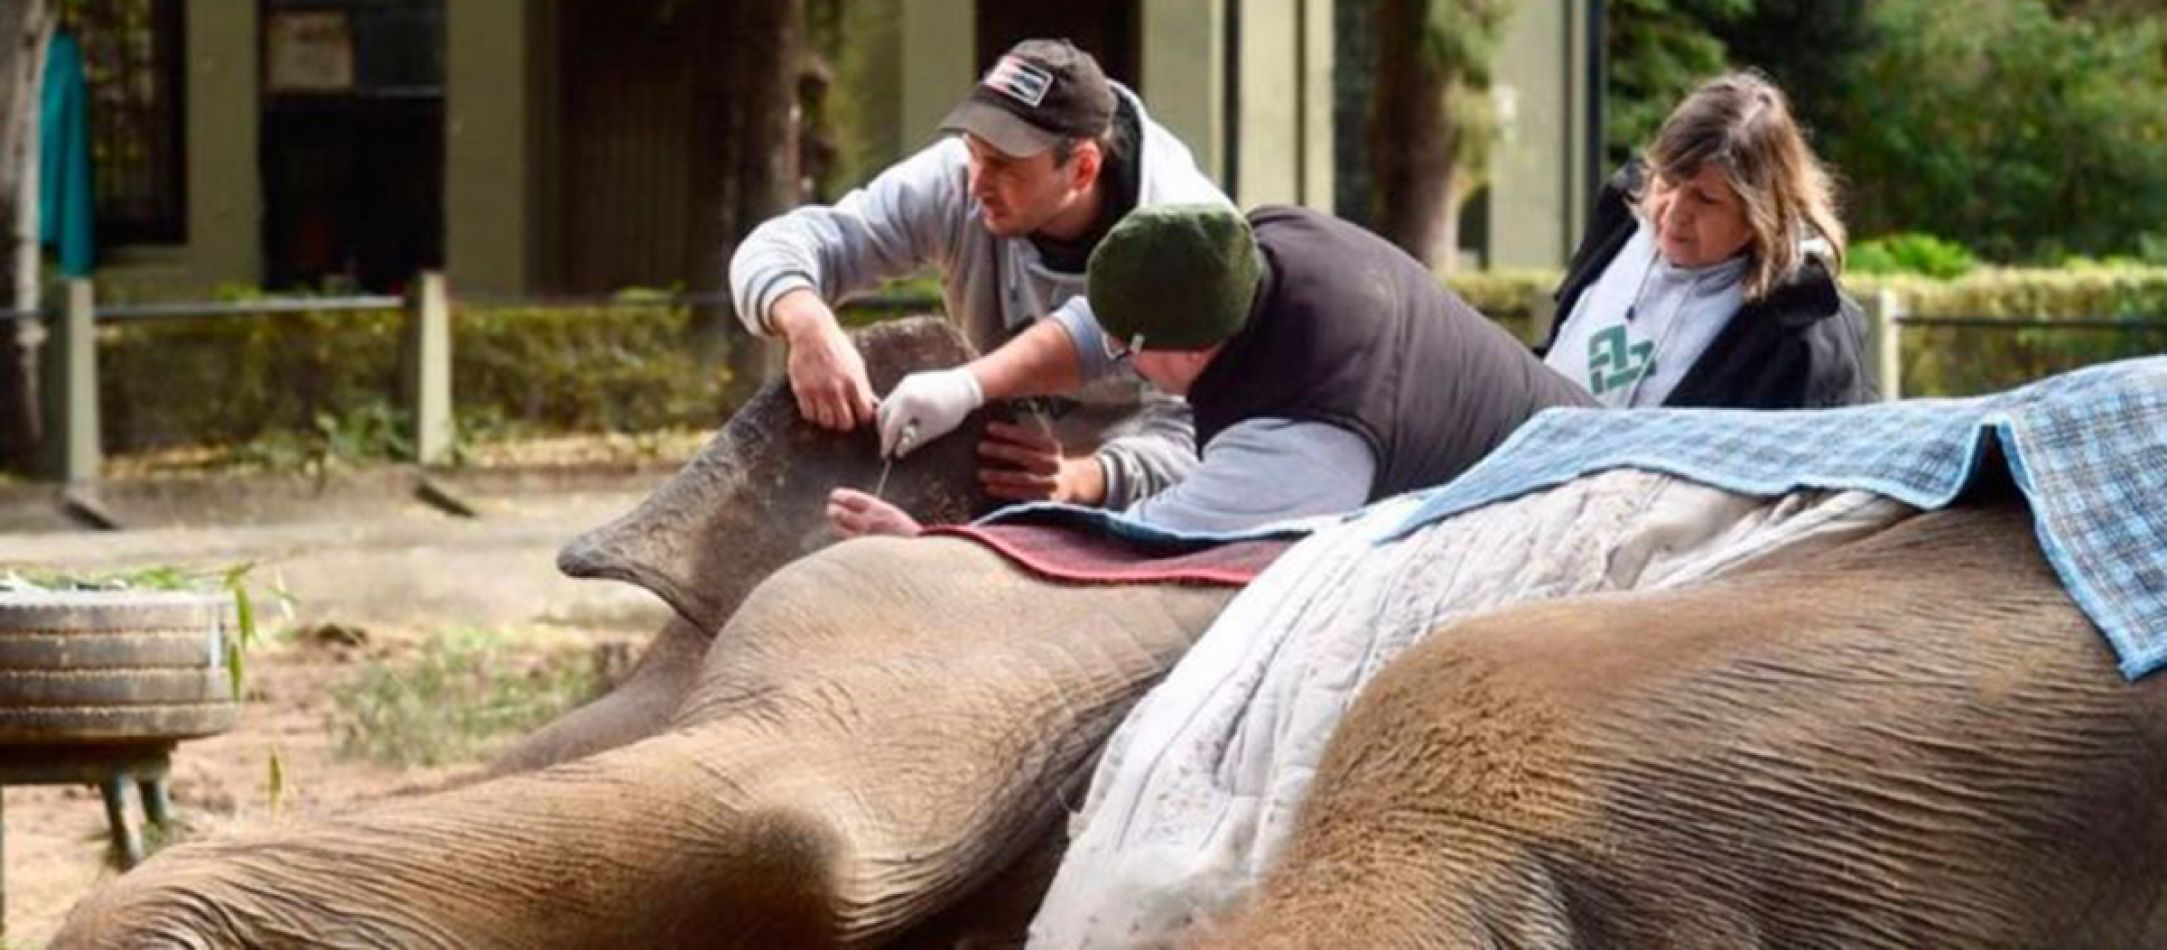 La elefanta Pelusa del zoológico de La Plata se encuentra en la etapa final de su vida